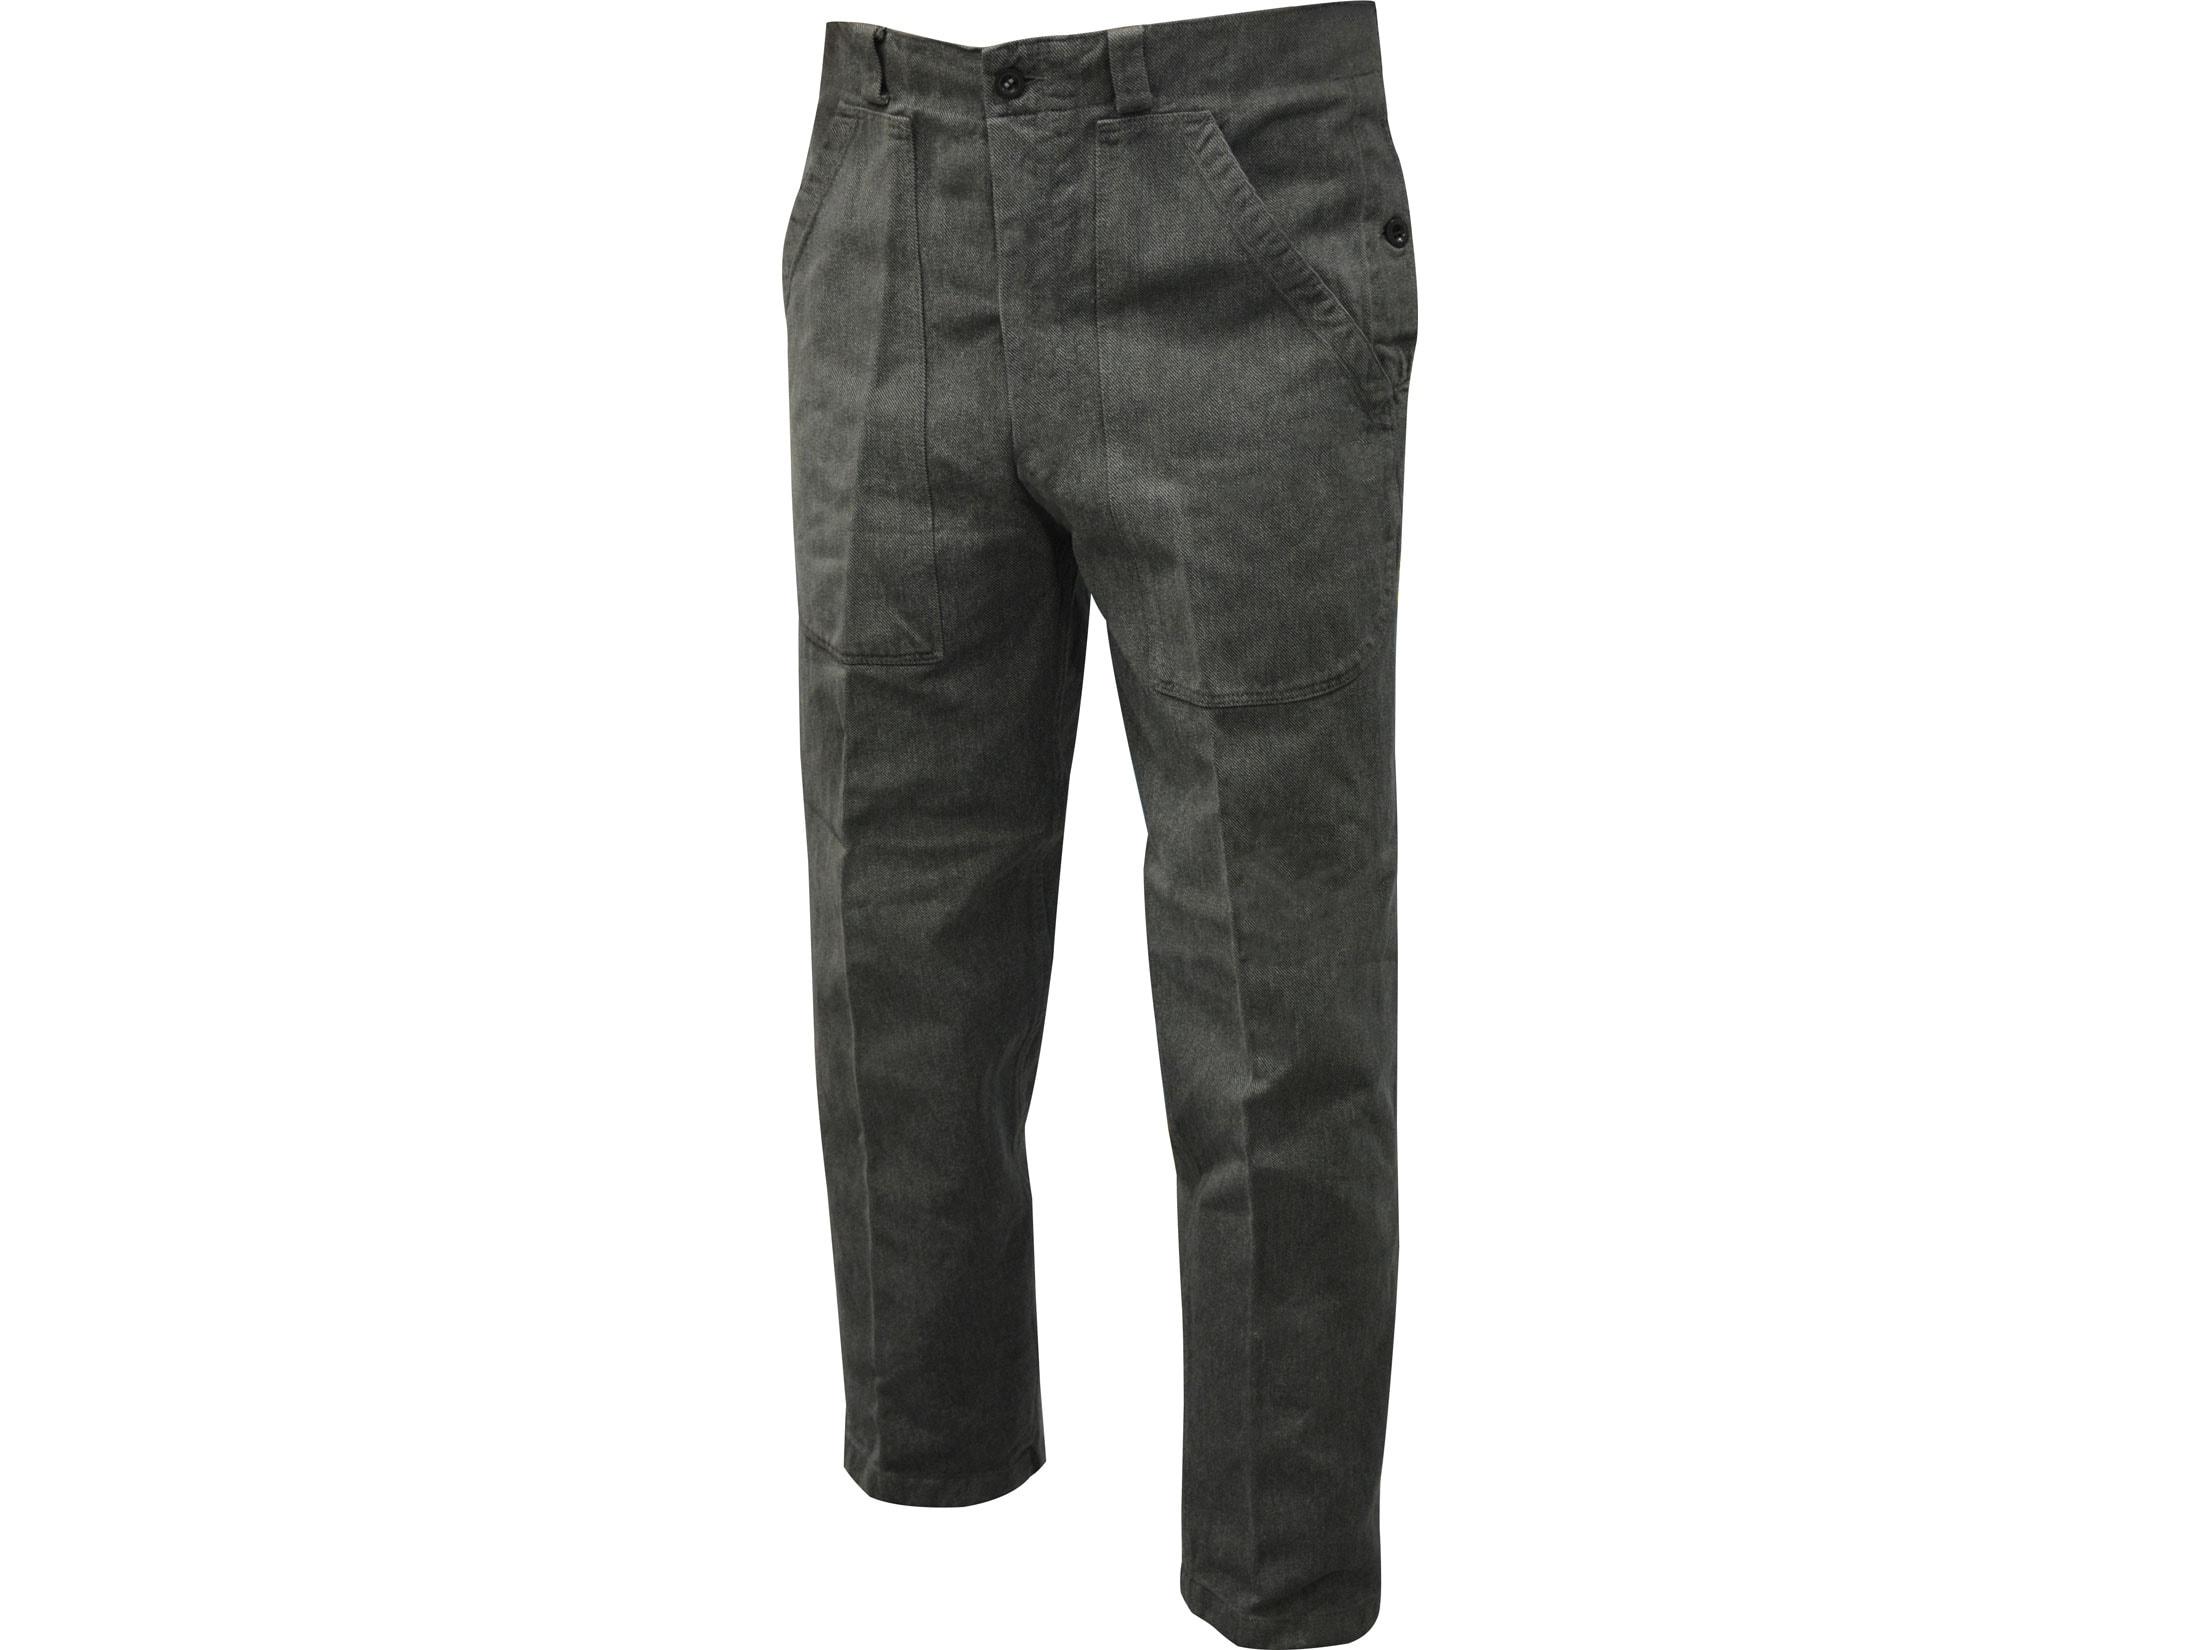 Genuine Swiss Army Grey Cotton Trousers Tough Denim Work Pants GRADE 1 or 2